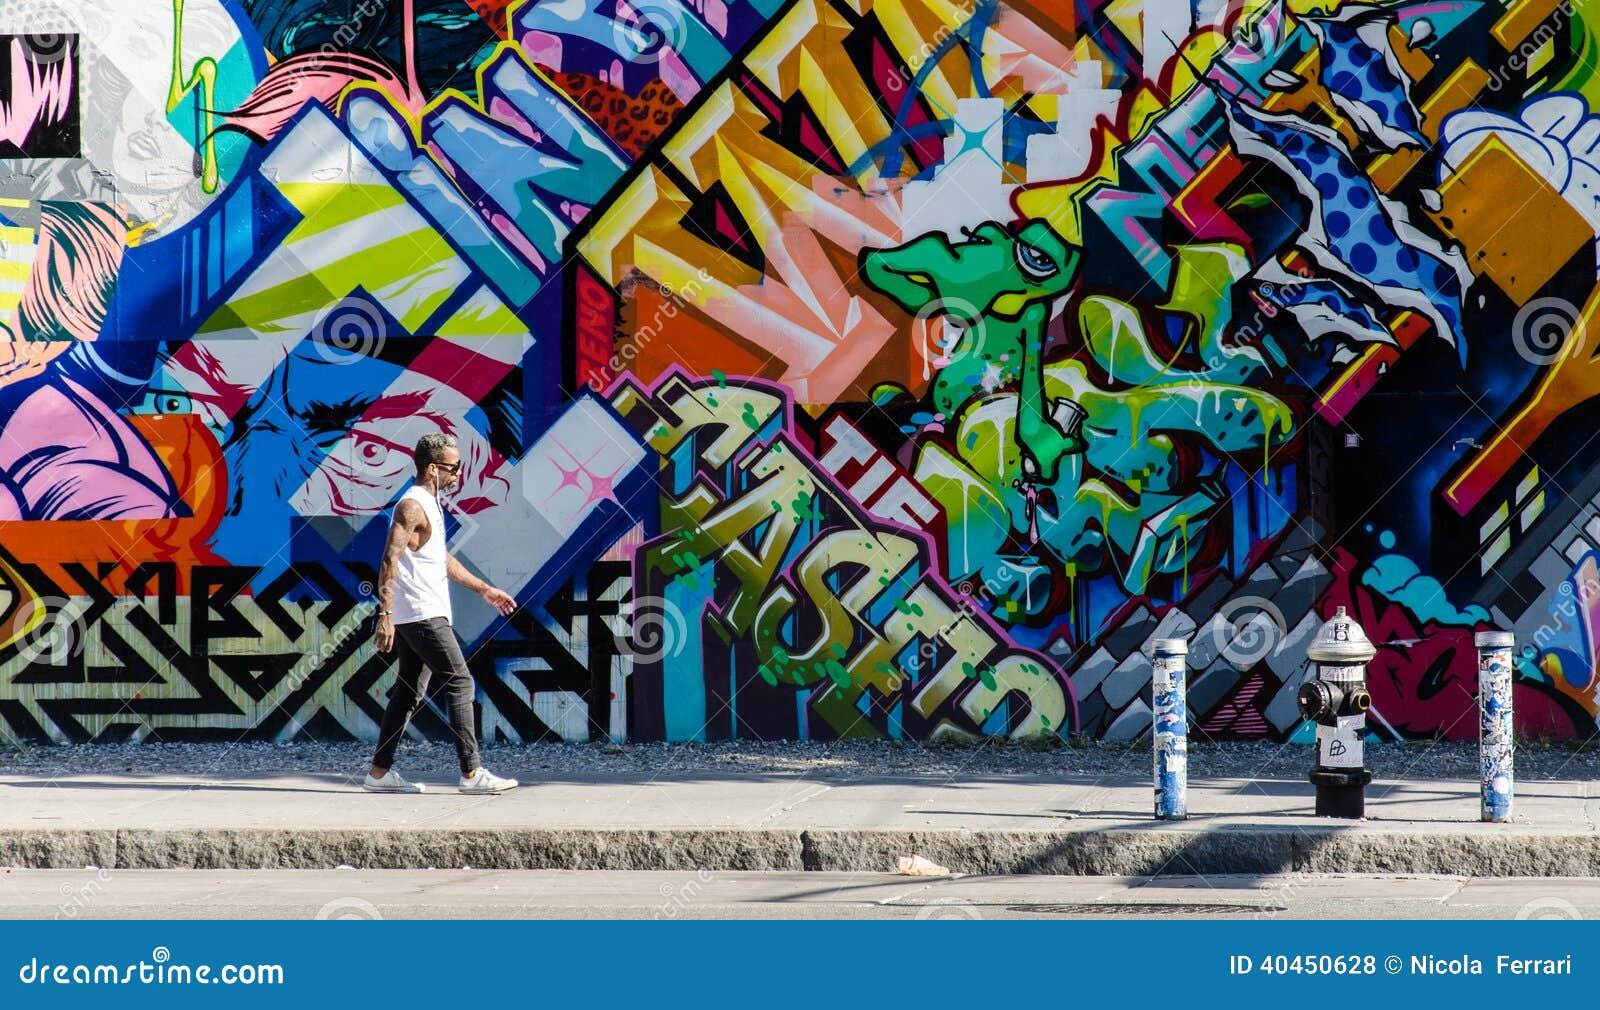 BROOKLYN, NYC, US, October 1 2013: Street art in Brooklyn. Hipster male walking next to a wall of graffiti in Brooklyn, New